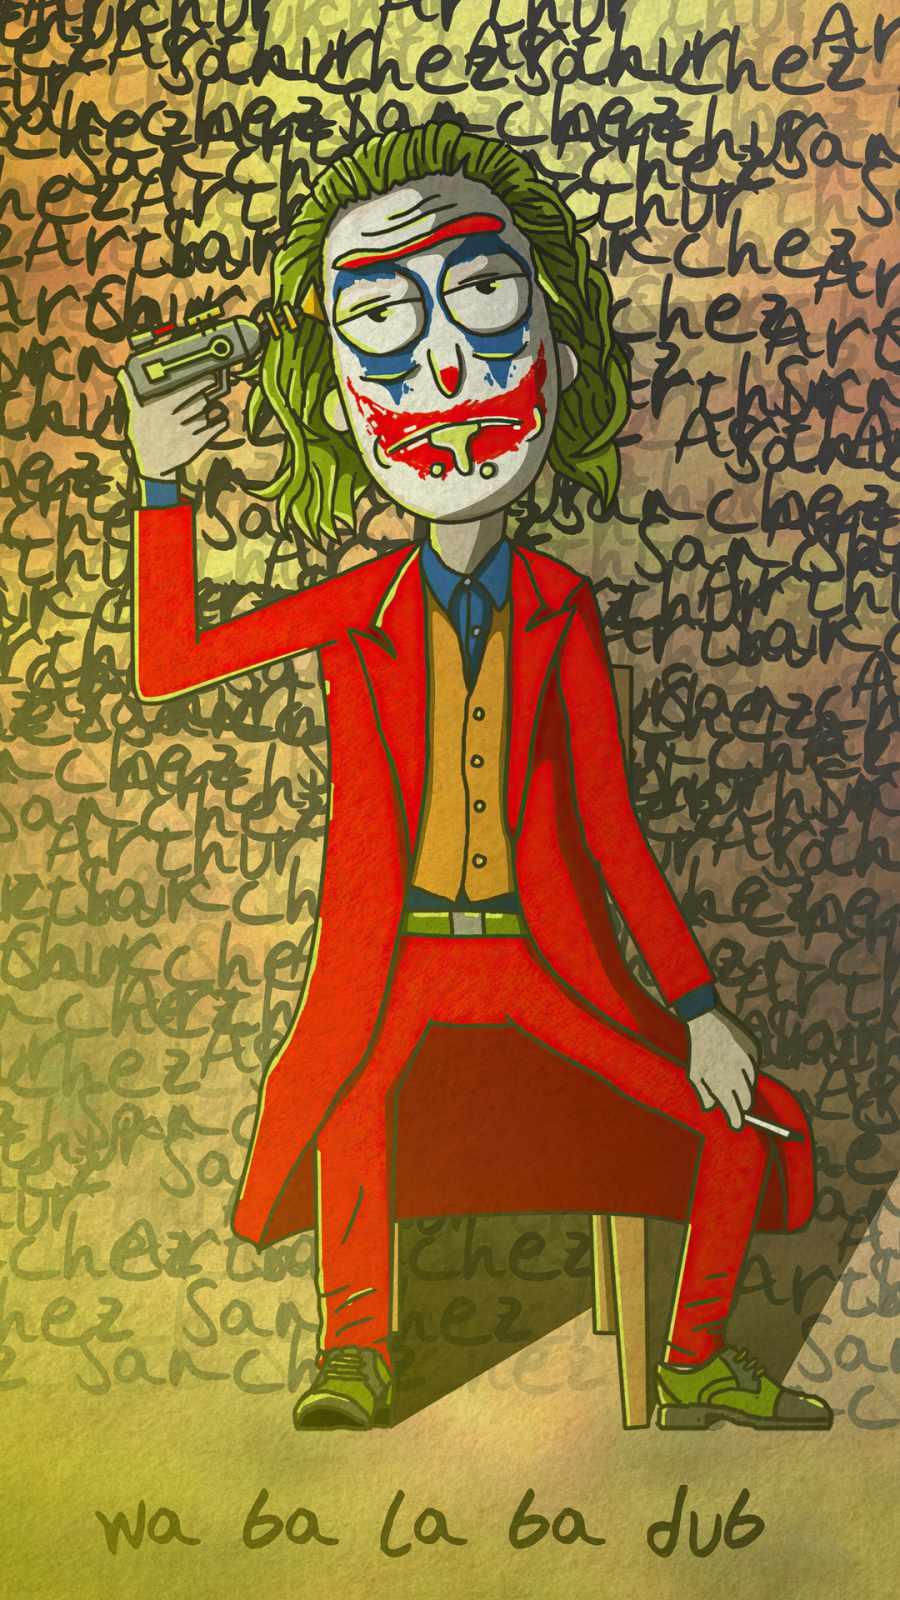 rick x joker